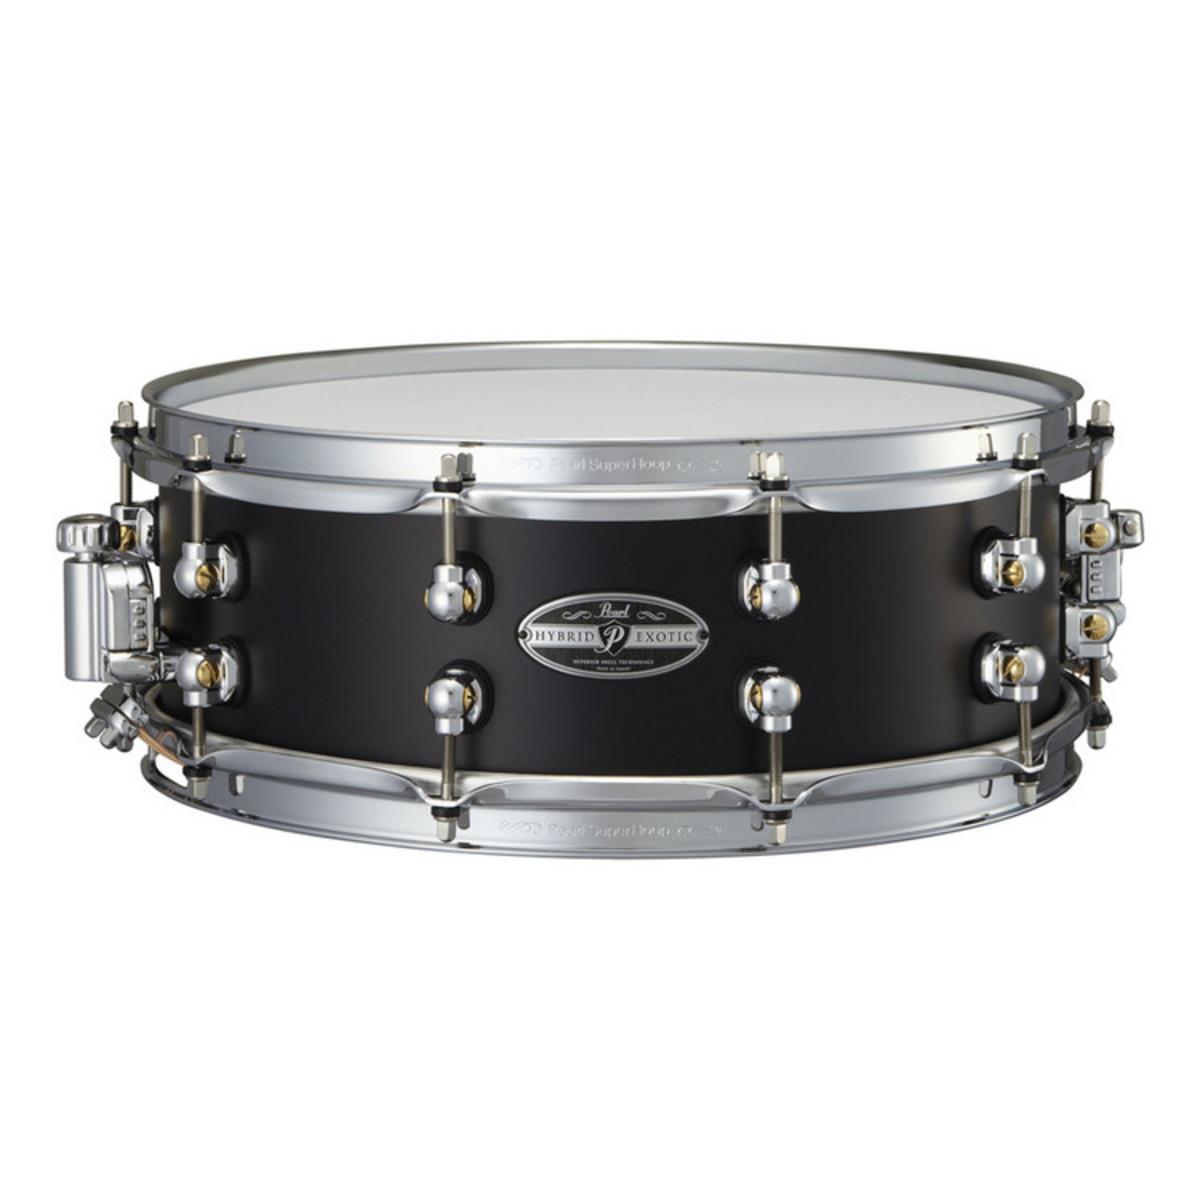 pearl hybrid exotic 14 39 39 x 5 39 39 snare drum cast aluminium at gear4music. Black Bedroom Furniture Sets. Home Design Ideas